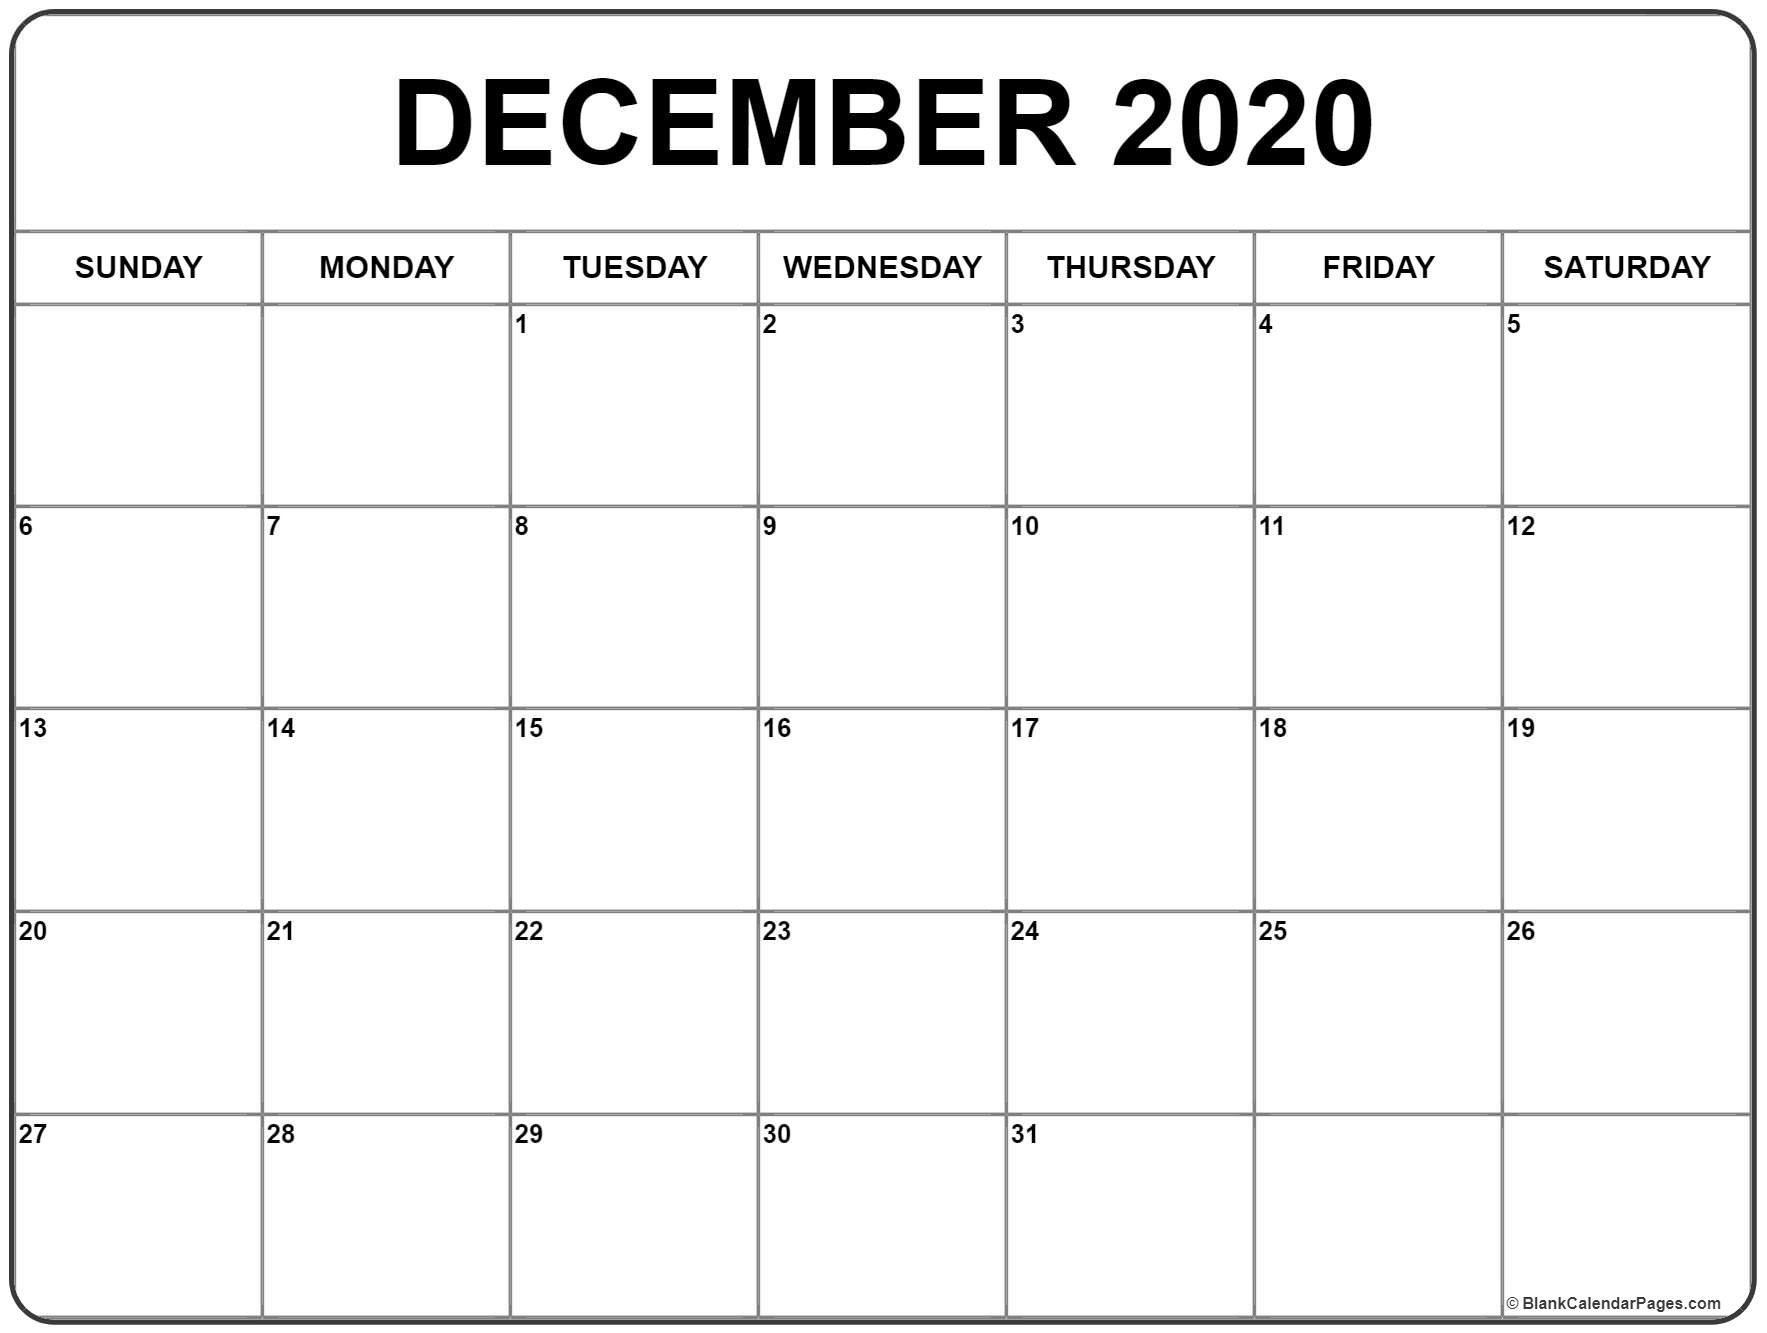 December 2020 Calendar   Free Printable Monthly Calendars